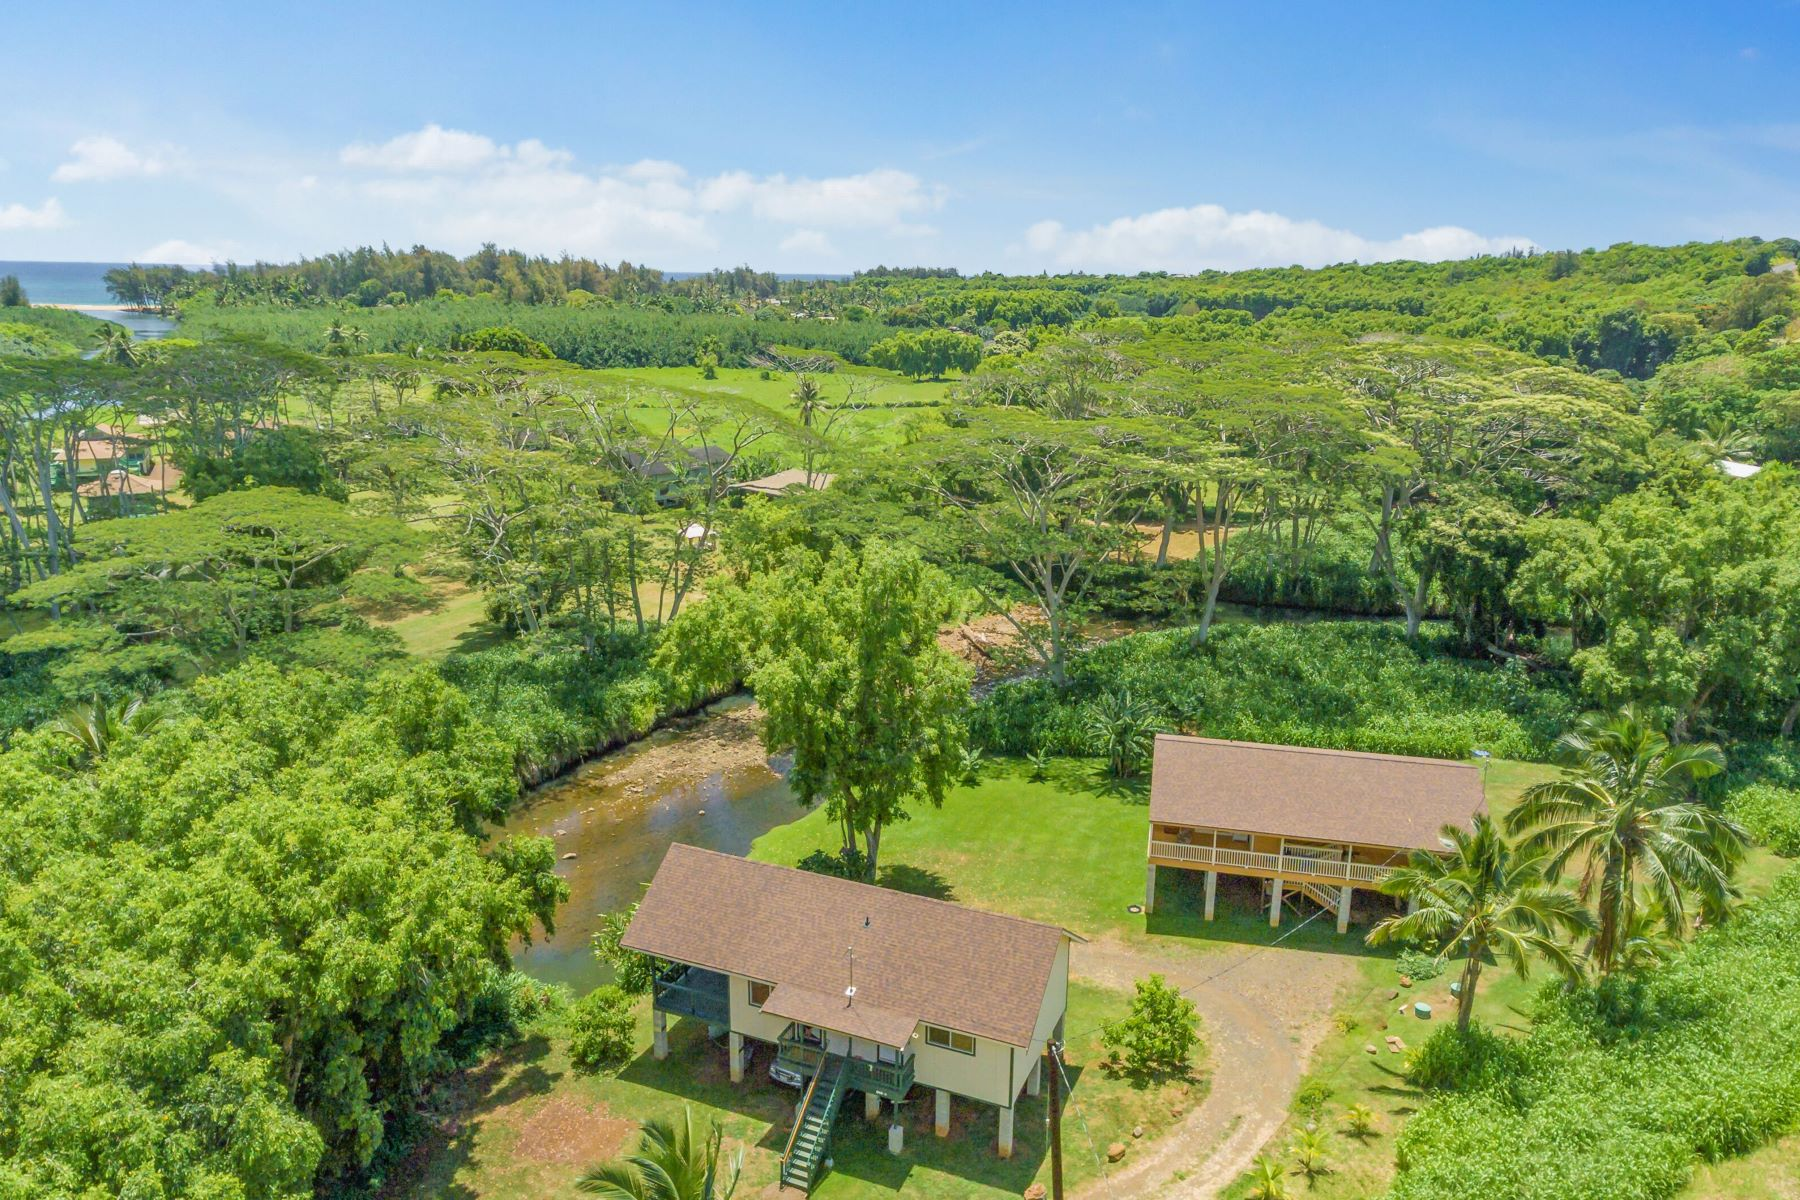 Single Family Homes för Försäljning vid Anahola River home plus ADU 4-4284 Kuhio Hwy, Anahola, Hawaii 96703 Förenta staterna